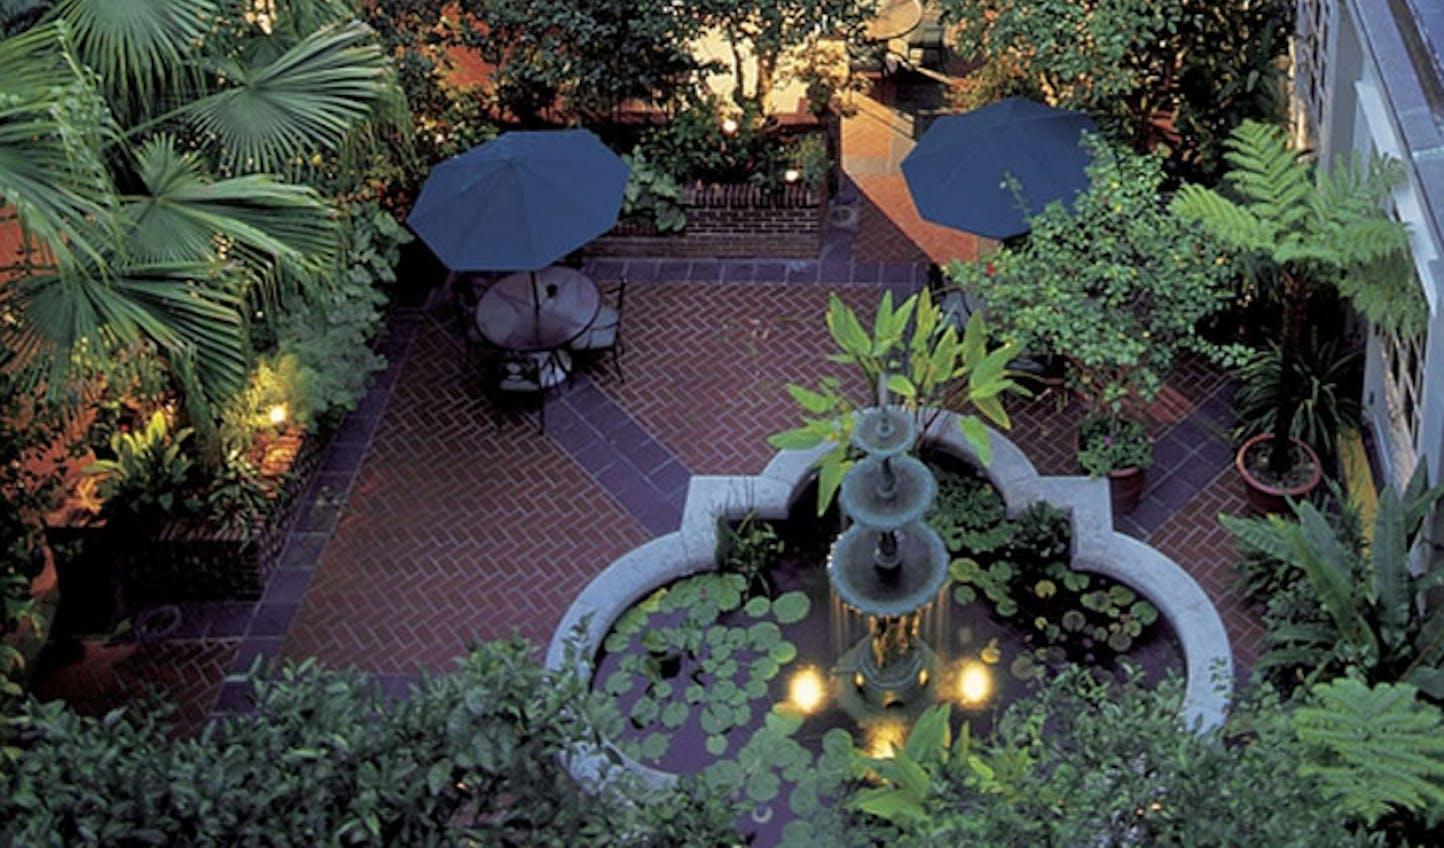 Royal Sonesta Hotel courtyard